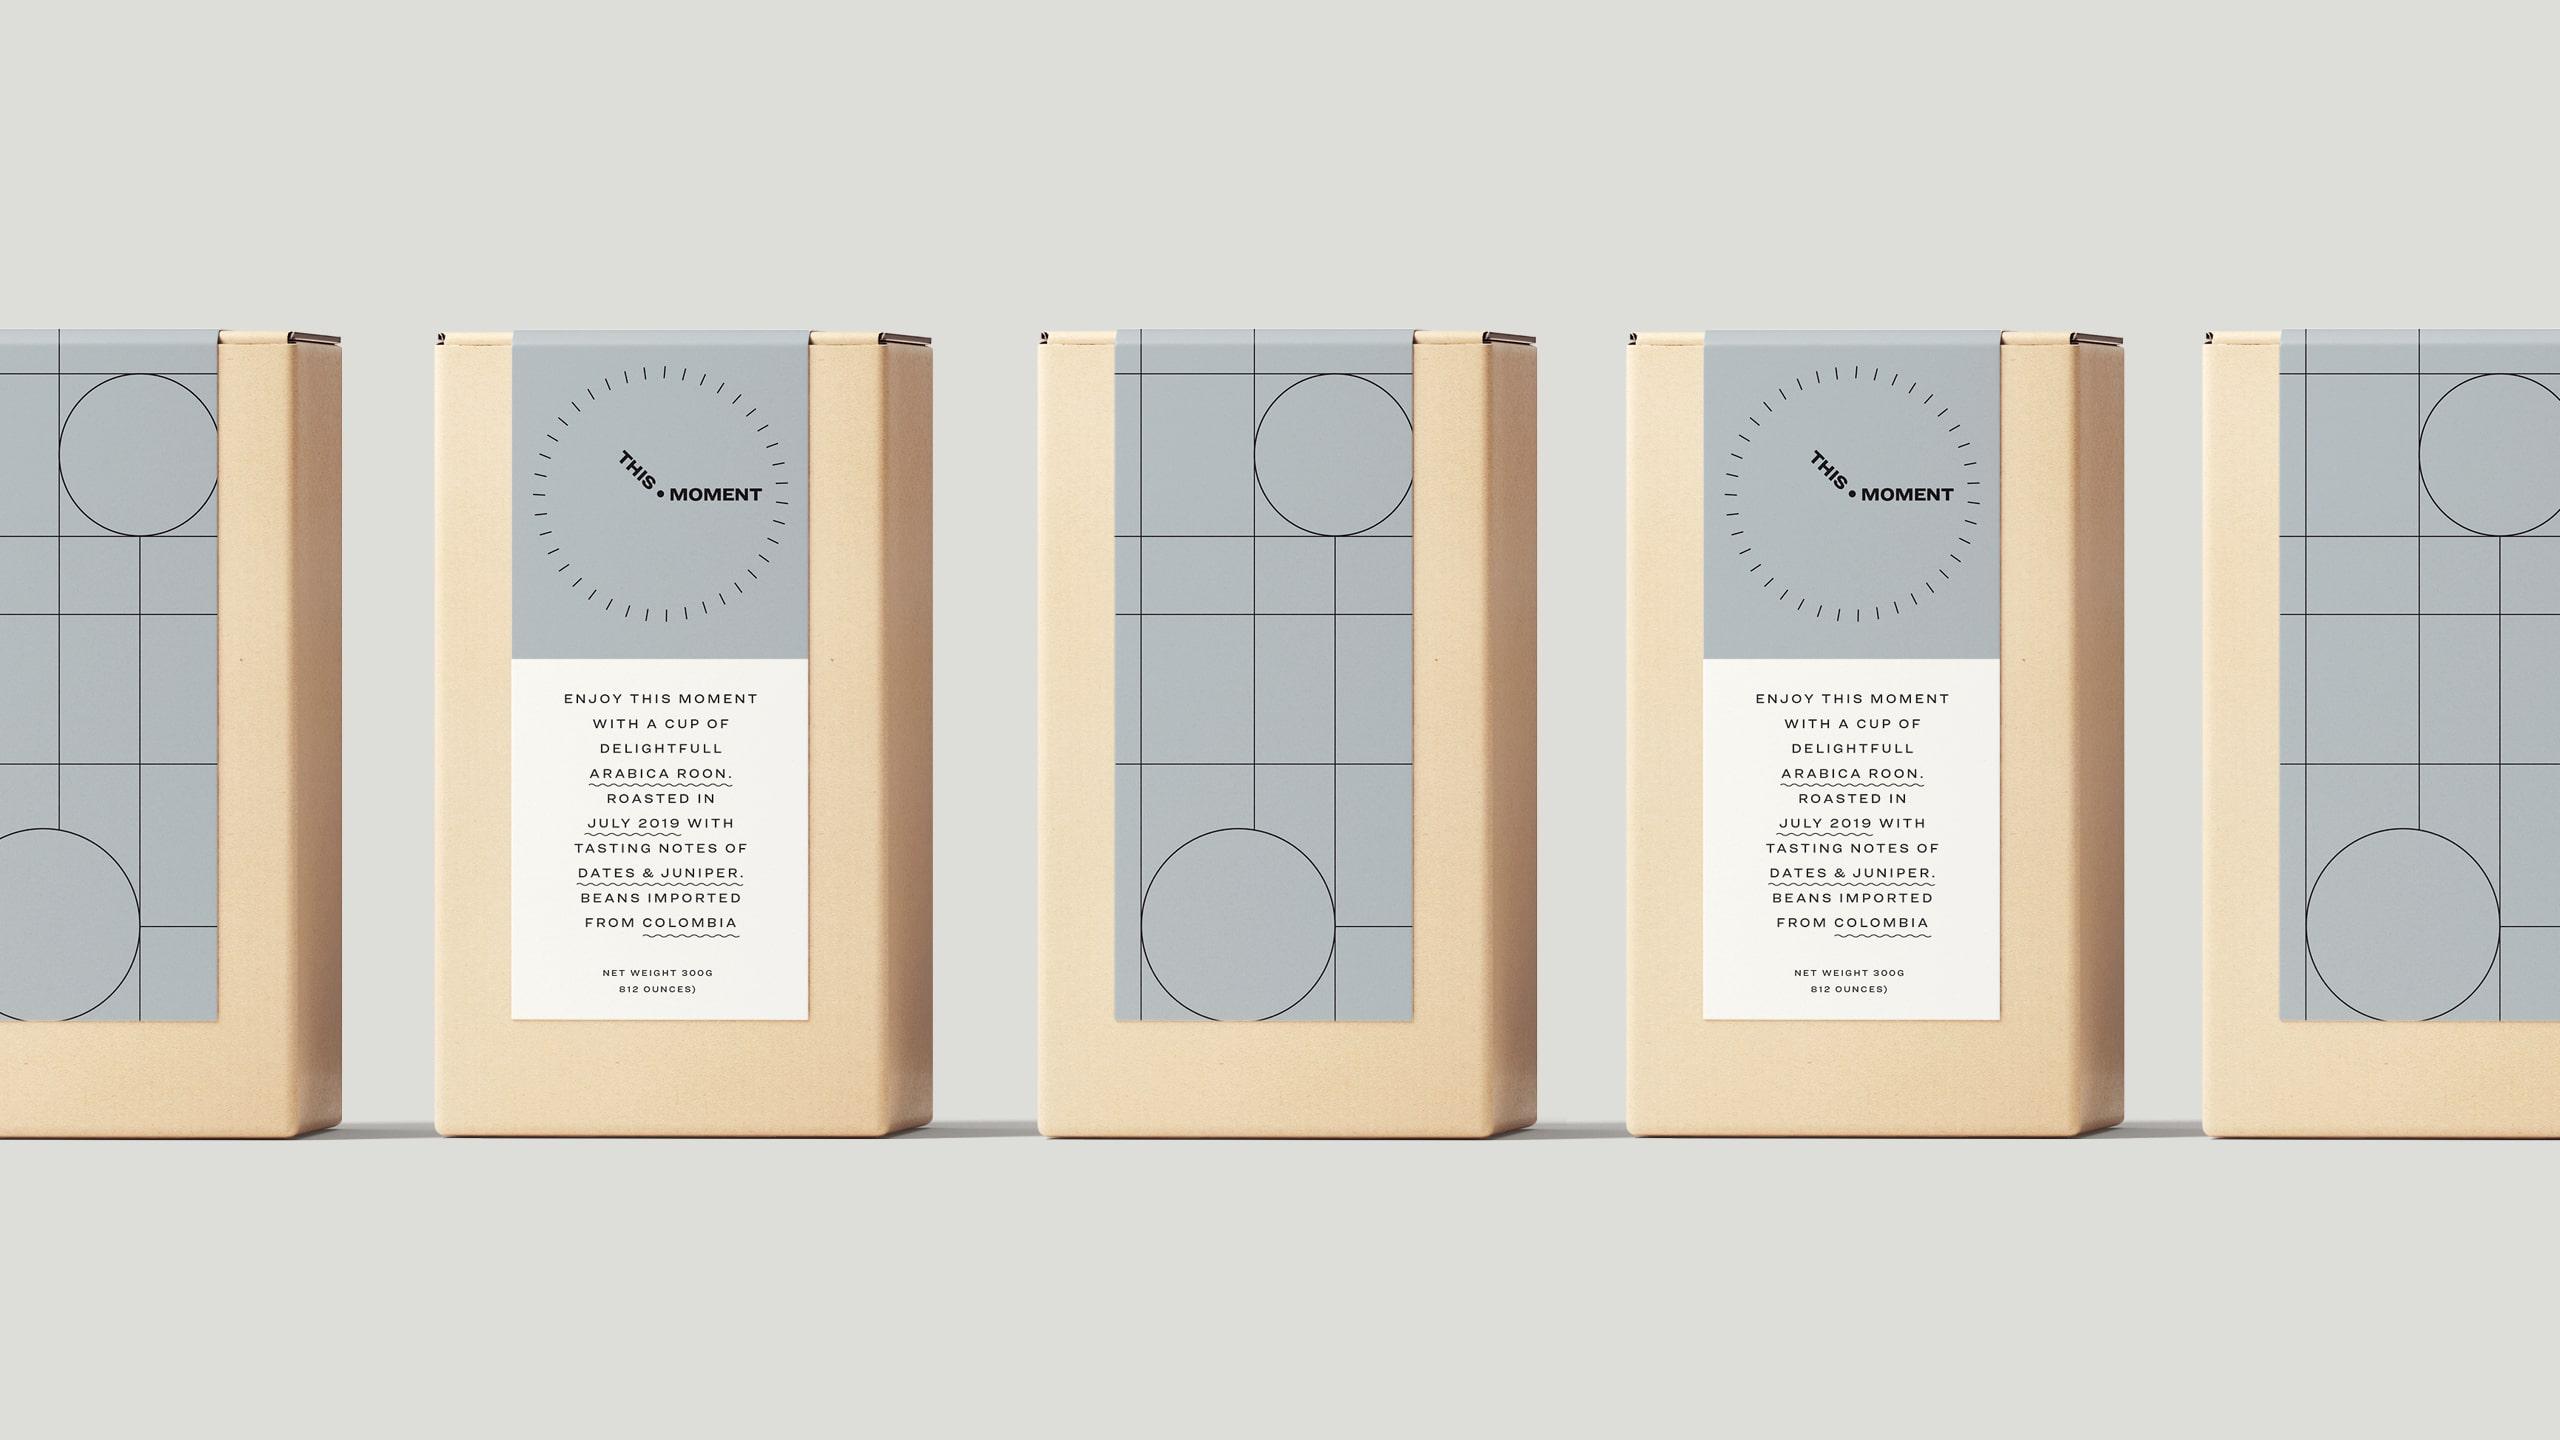 mantik-digital-branding-development-agency-creative-app-ui-web-branding-21-min